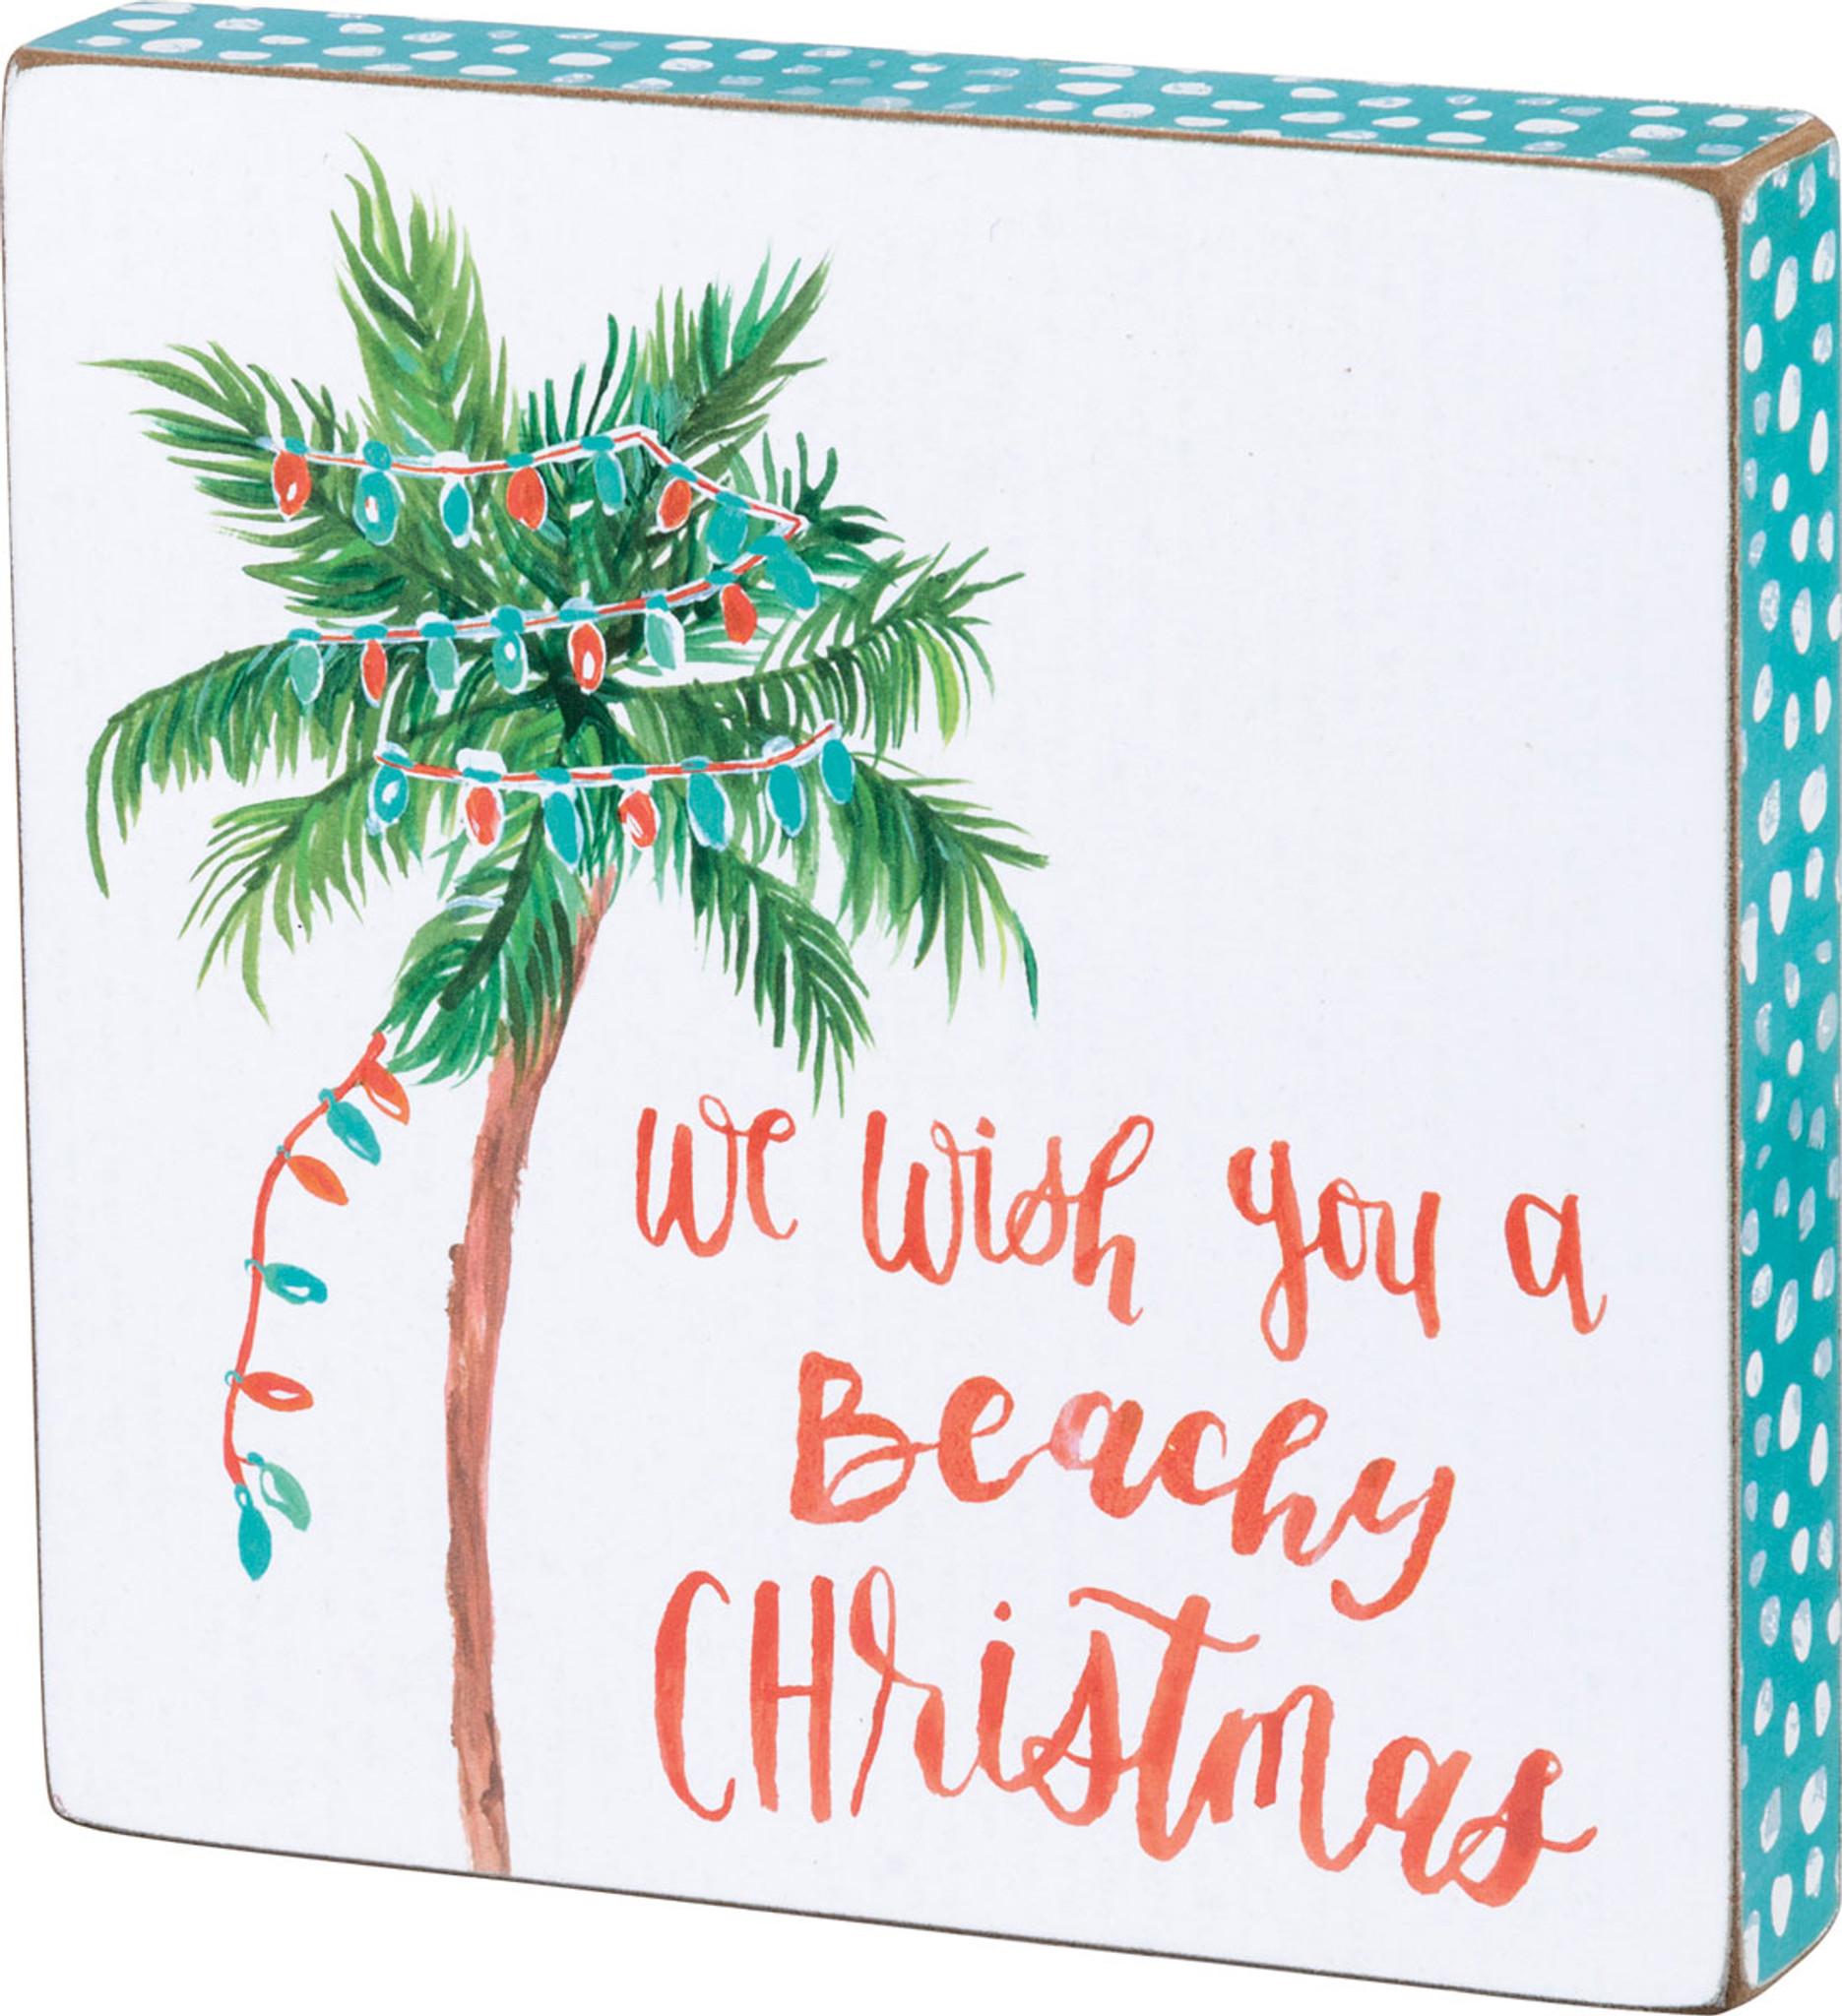 Beachy Christmas Palm Tree Coastal Holiday Decor Primitives By